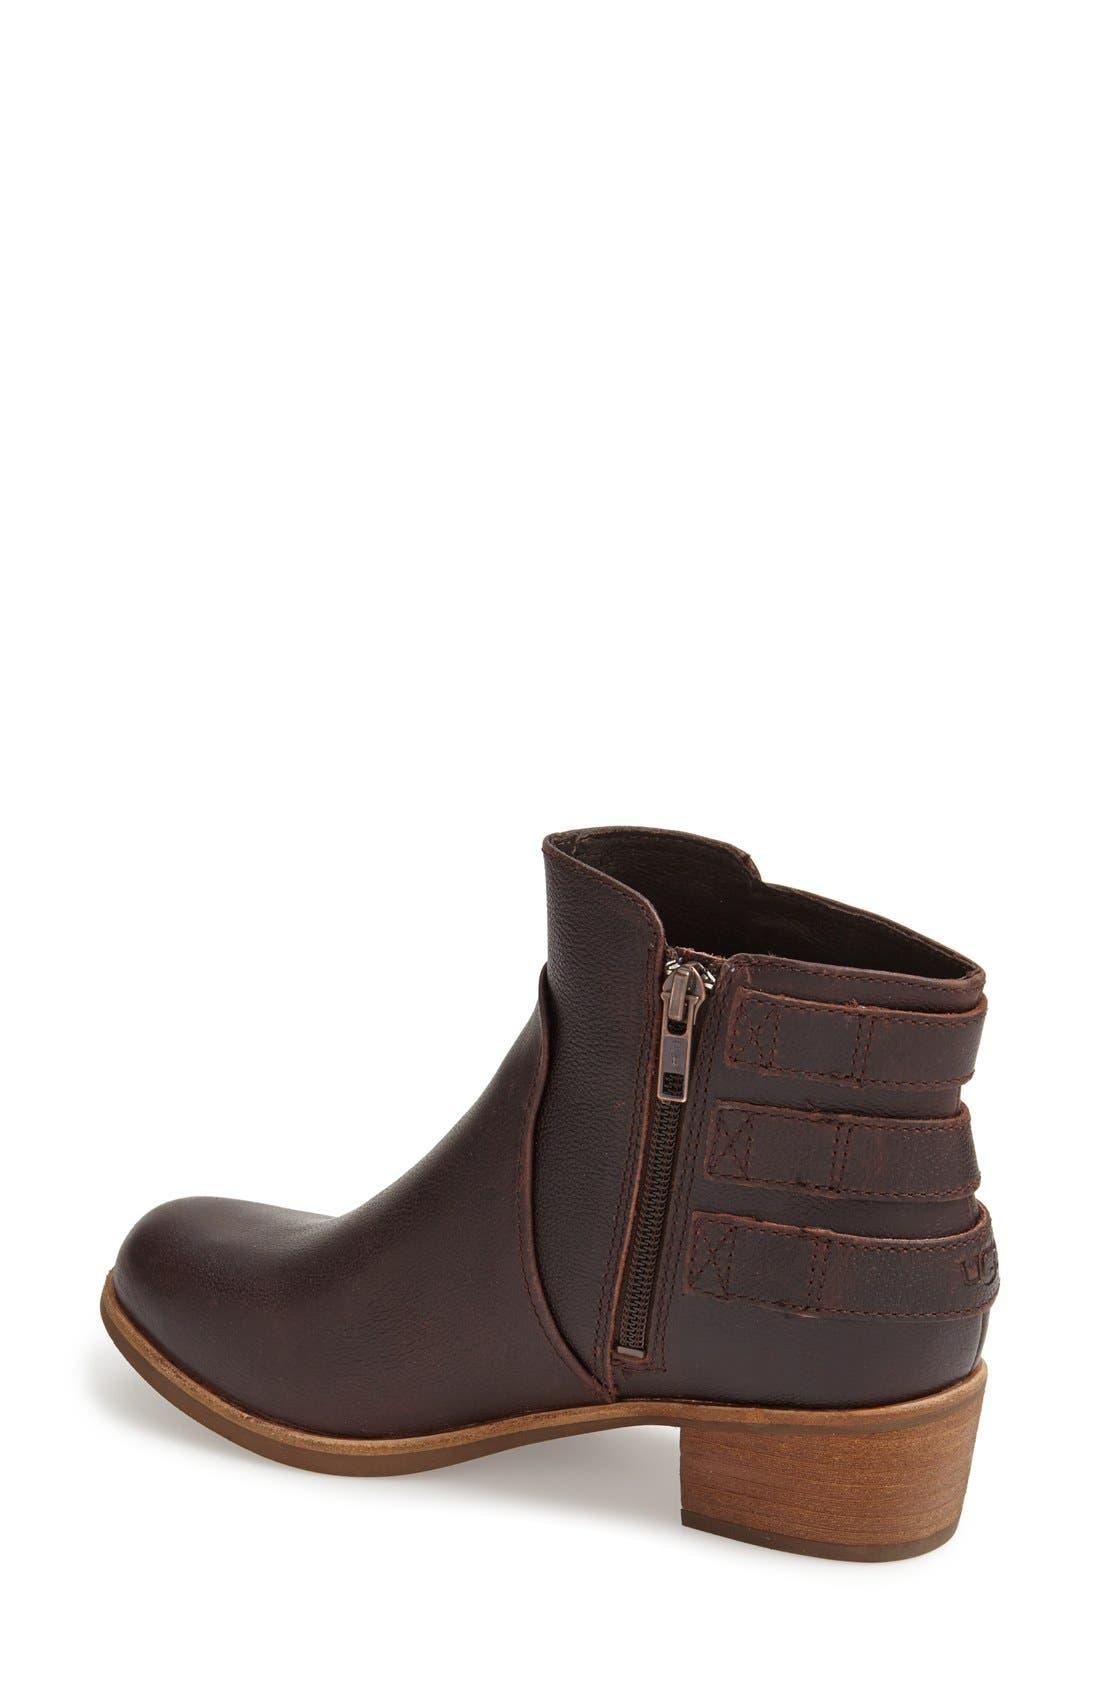 Alternate Image 2  - UGG® Australia 'Volta' Leather Ankle Boot (Women)